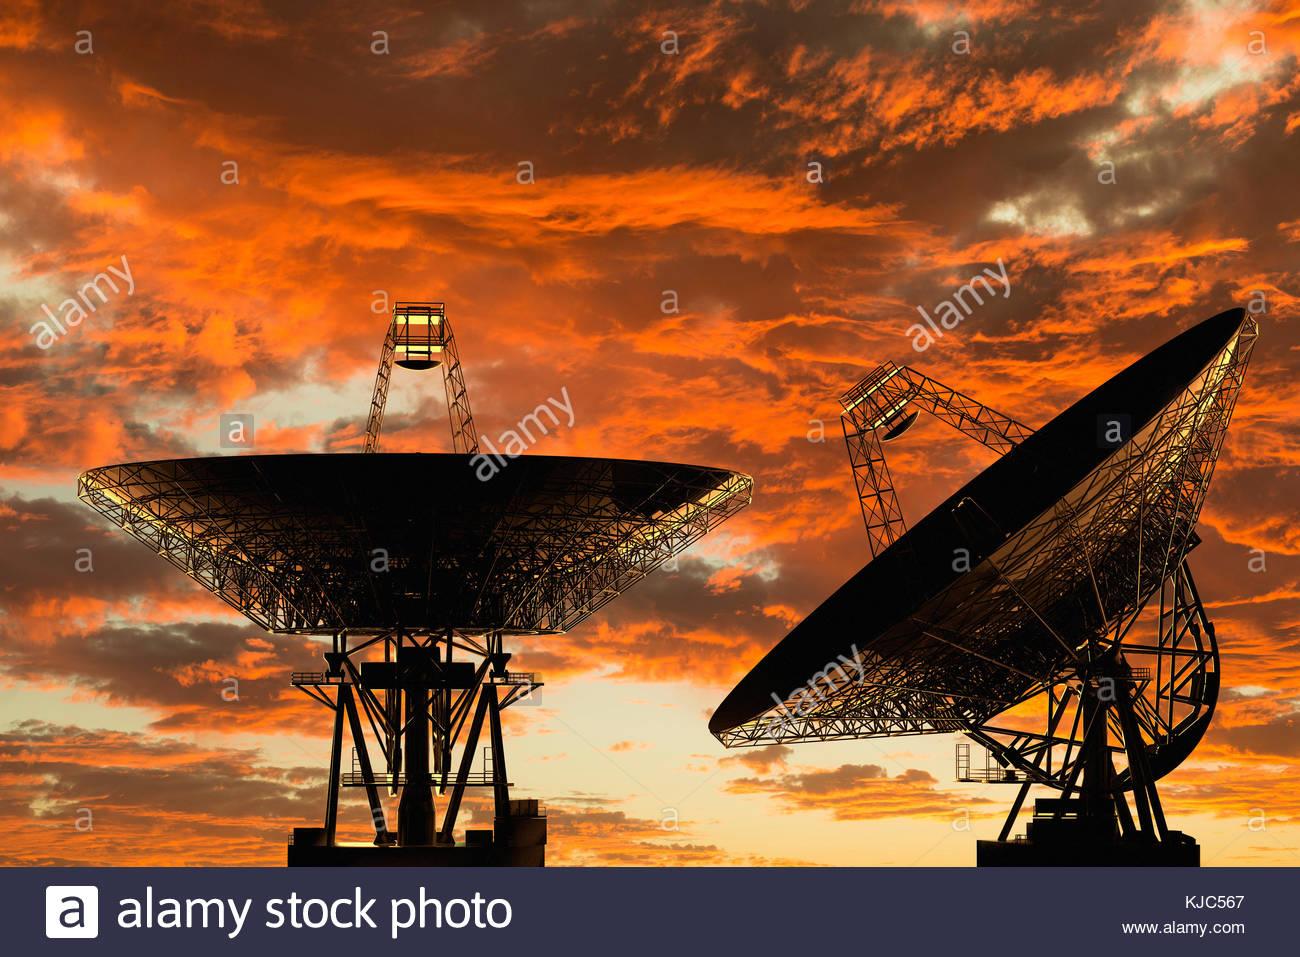 Digital illustration of radio telescopes at sunset - Stock Image